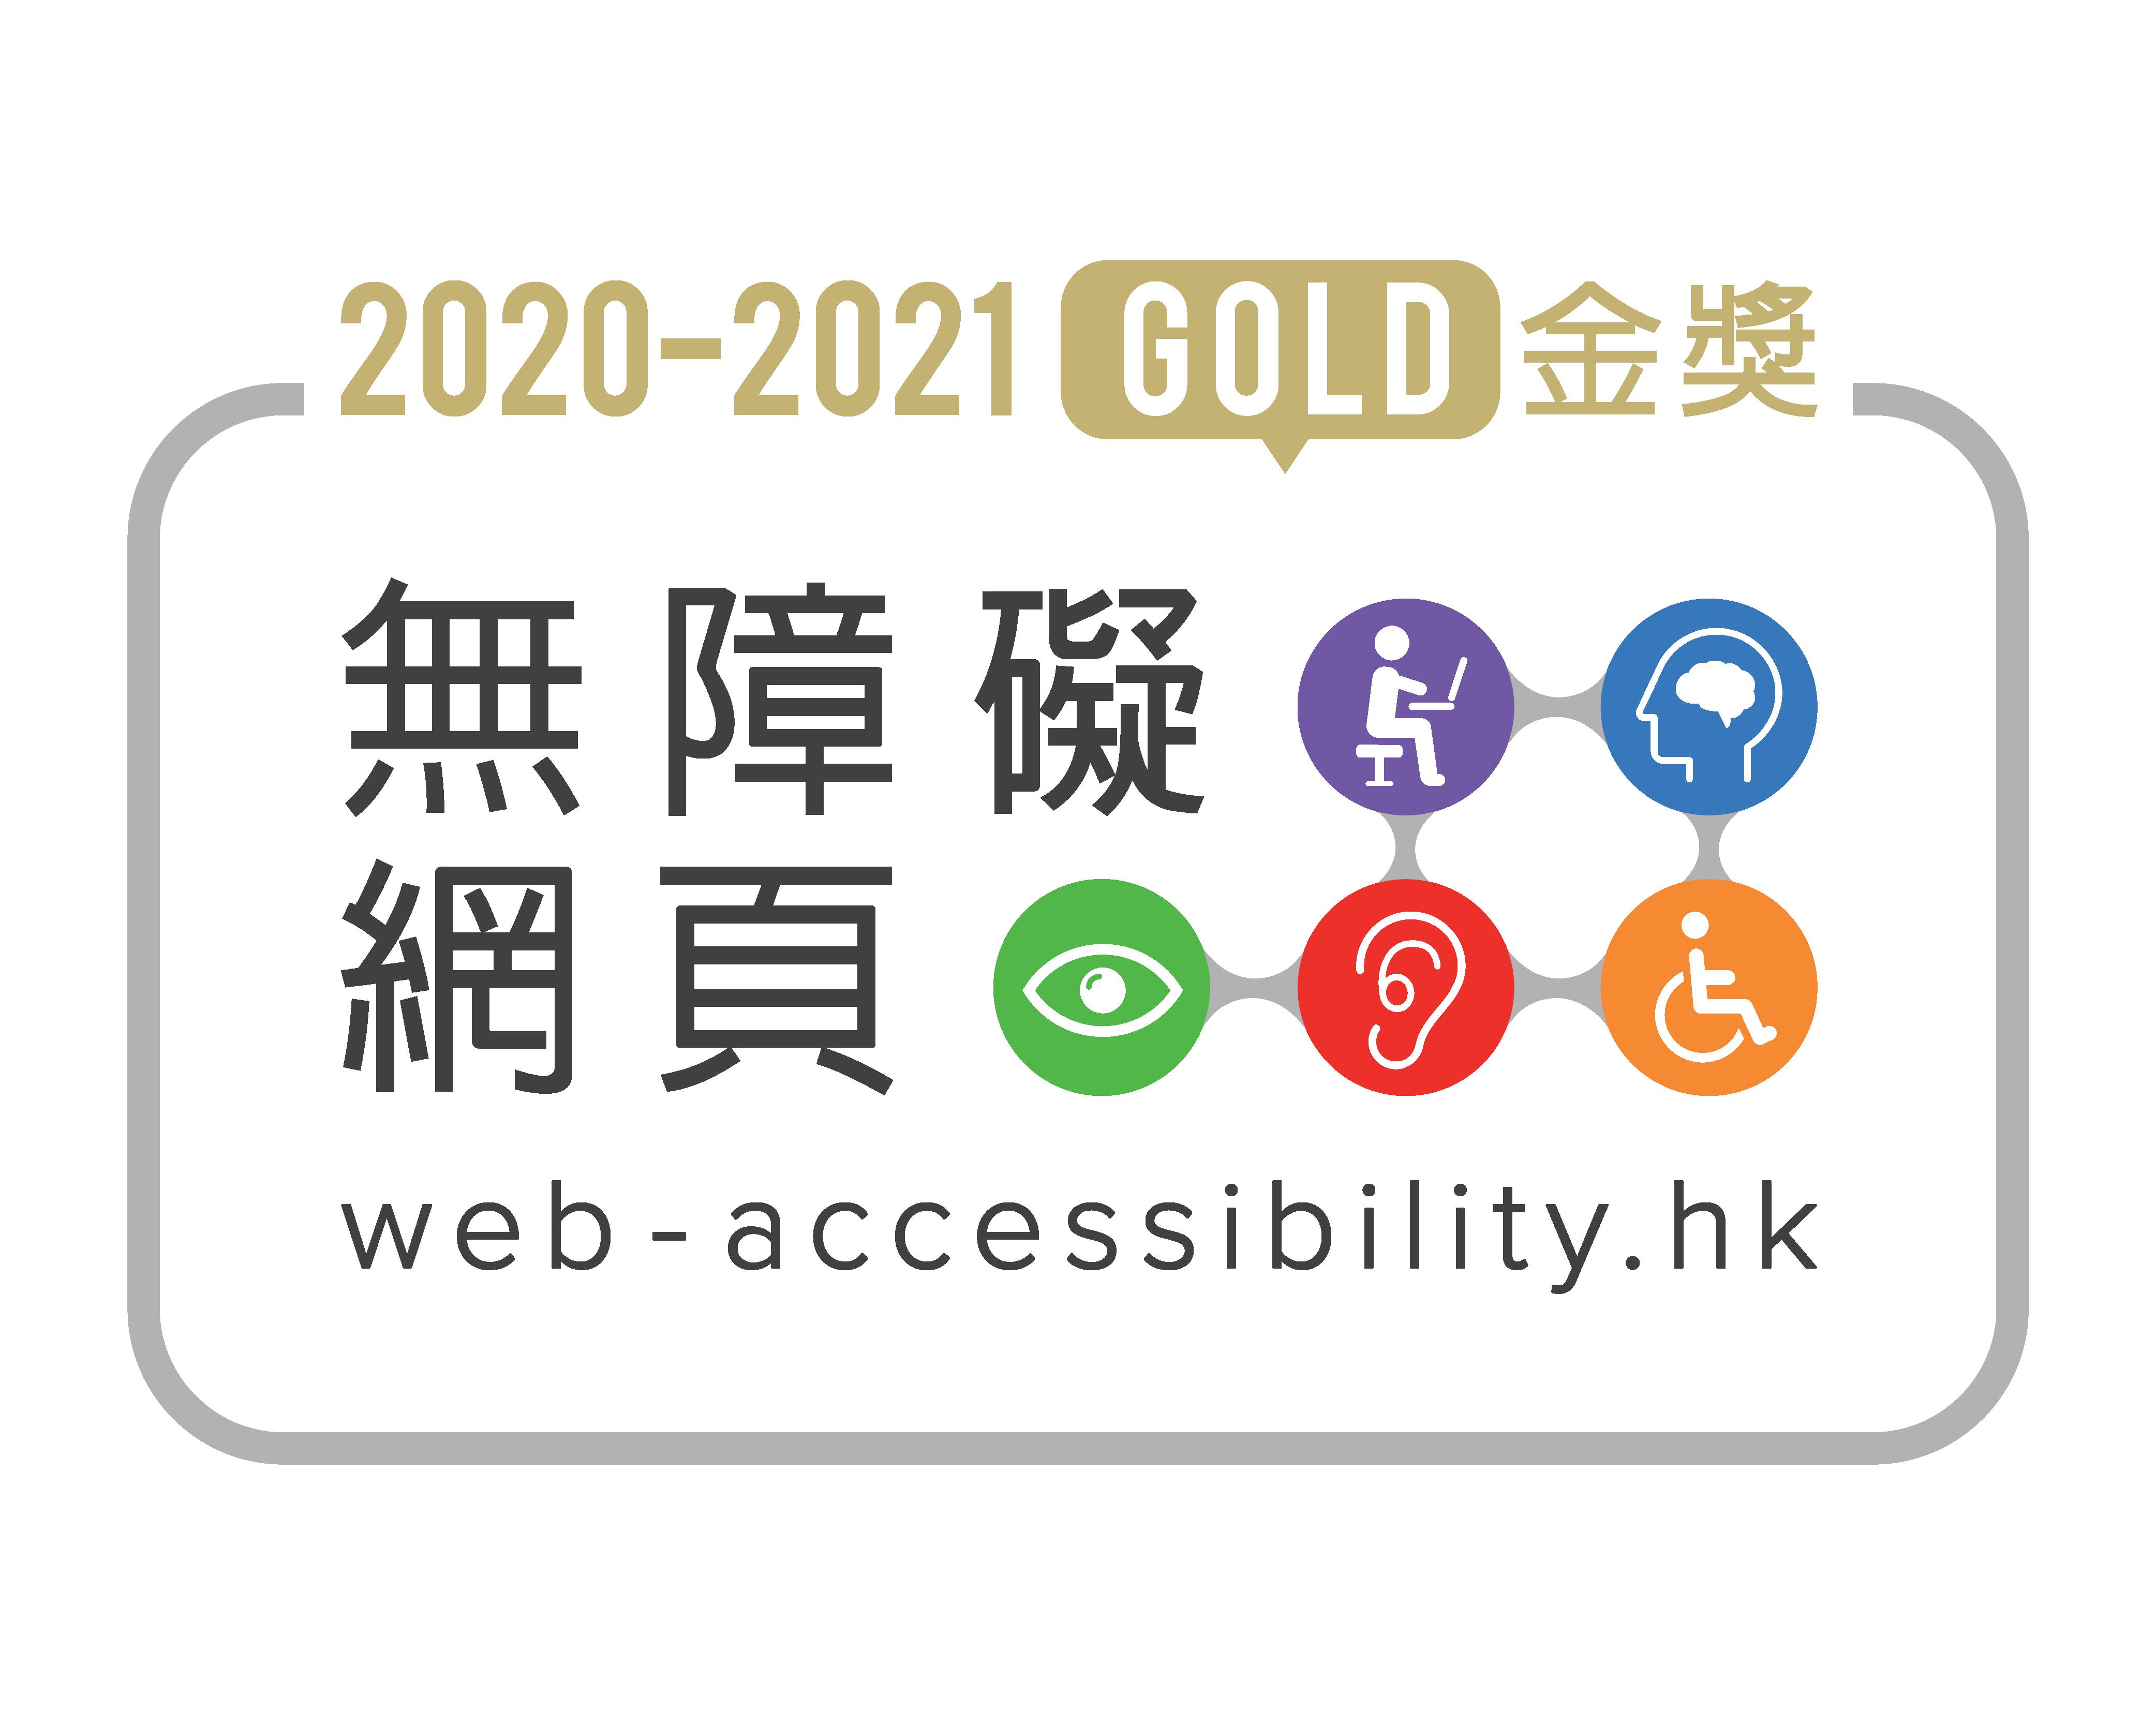 web accessibility gold award 2019